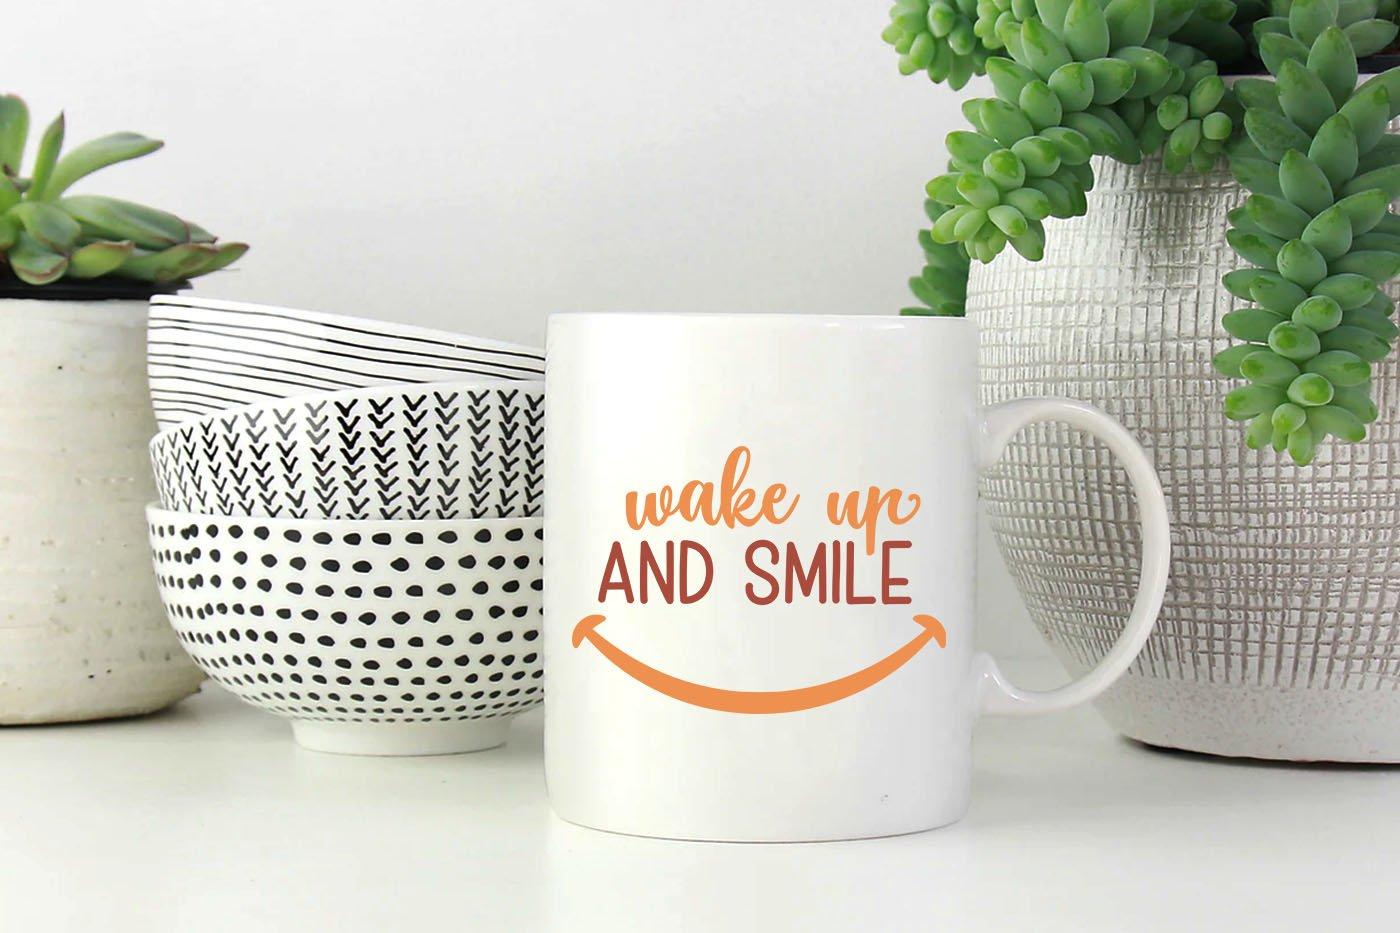 Wake Up And Smile Svg Cut Files 530209 Hand Lettered Design Bundles